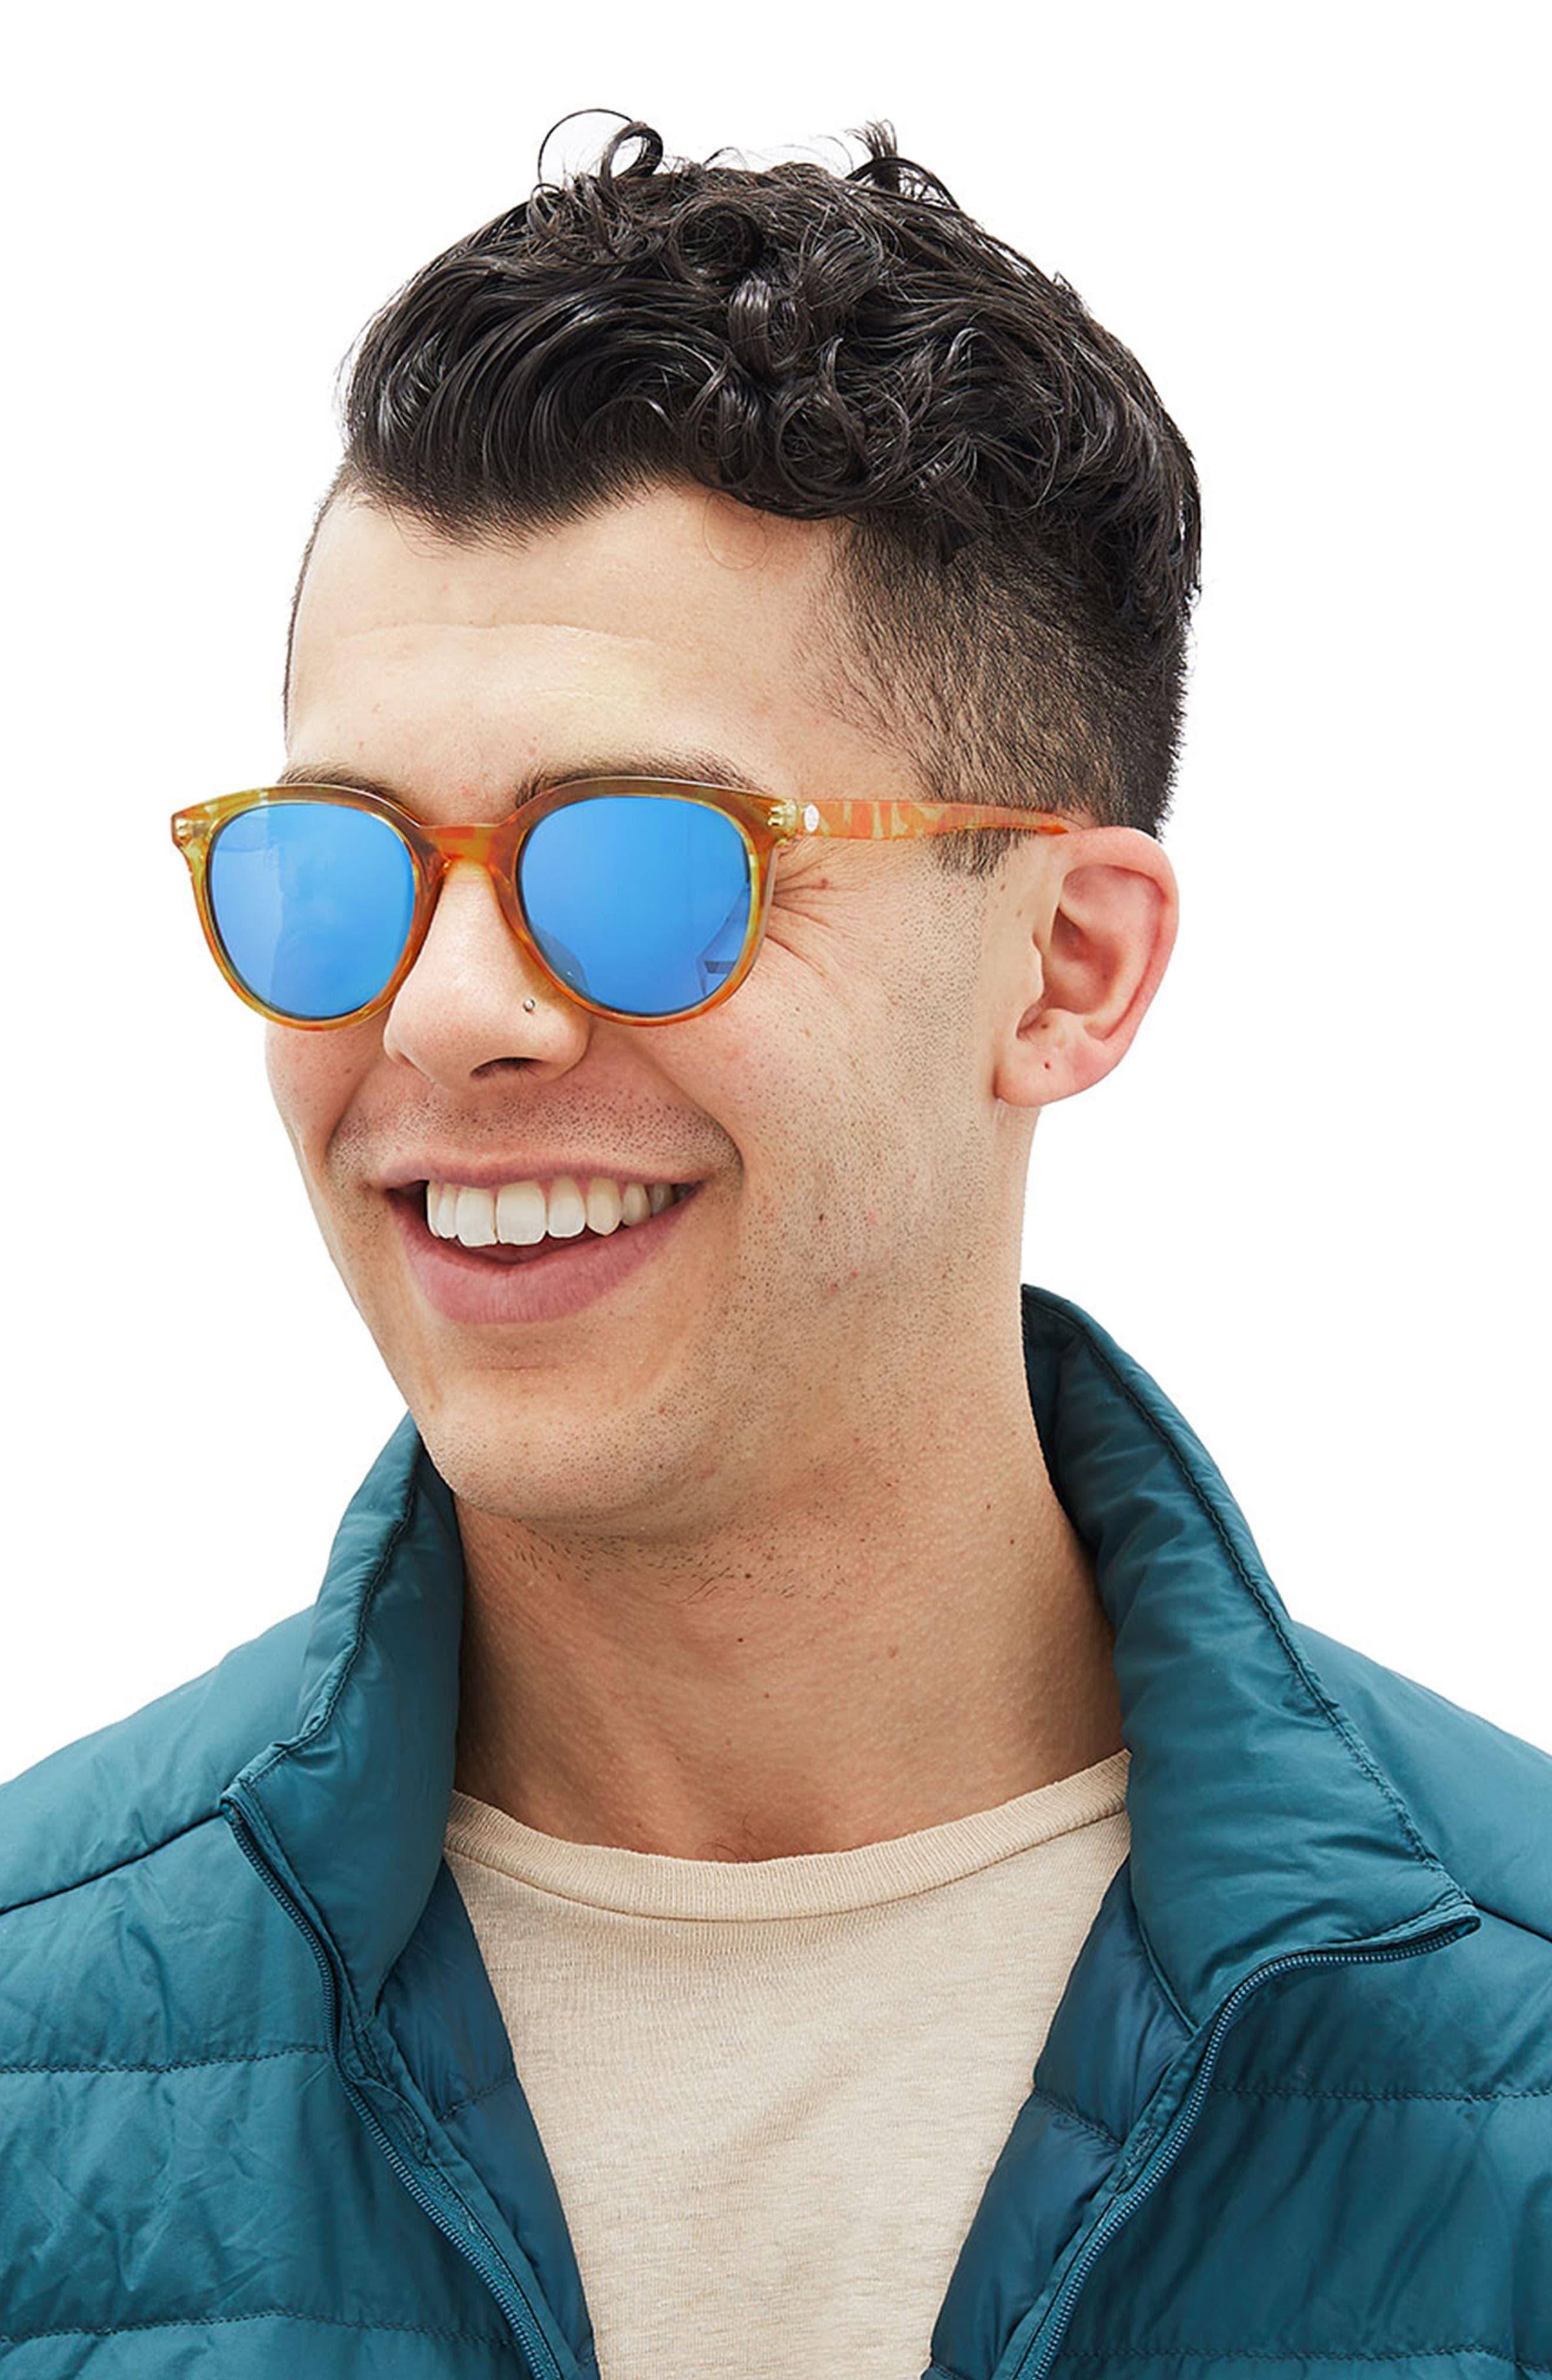 Makani 51mm Mirrored Polarized Sunglasses,                             Alternate thumbnail 3, color,                             Blond Tortoise/ Aqua